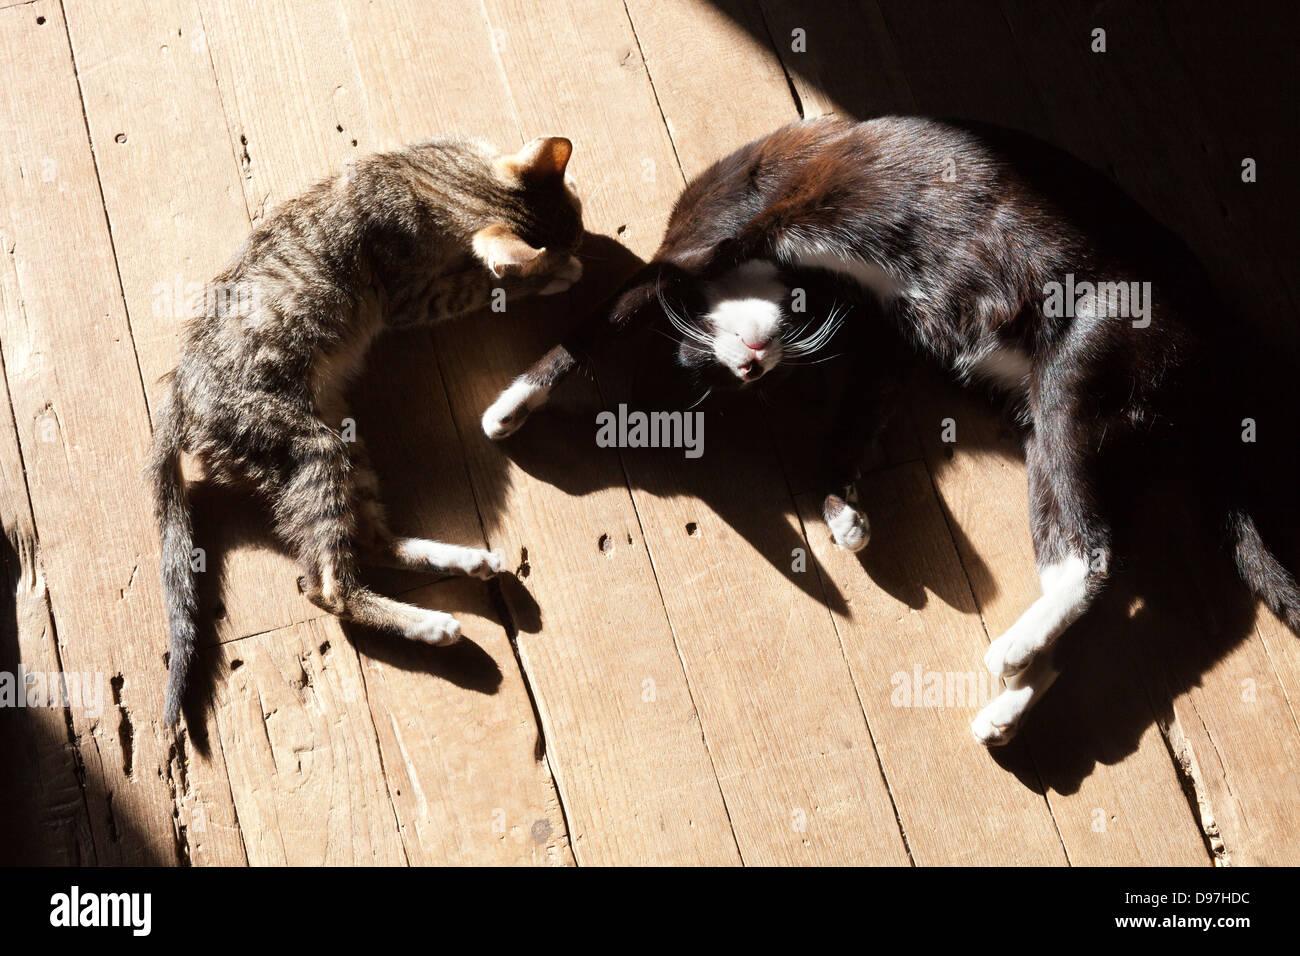 Dozing cats at the Nga Phe Kyaung jumping cat monastery, Myanmar - Stock Image